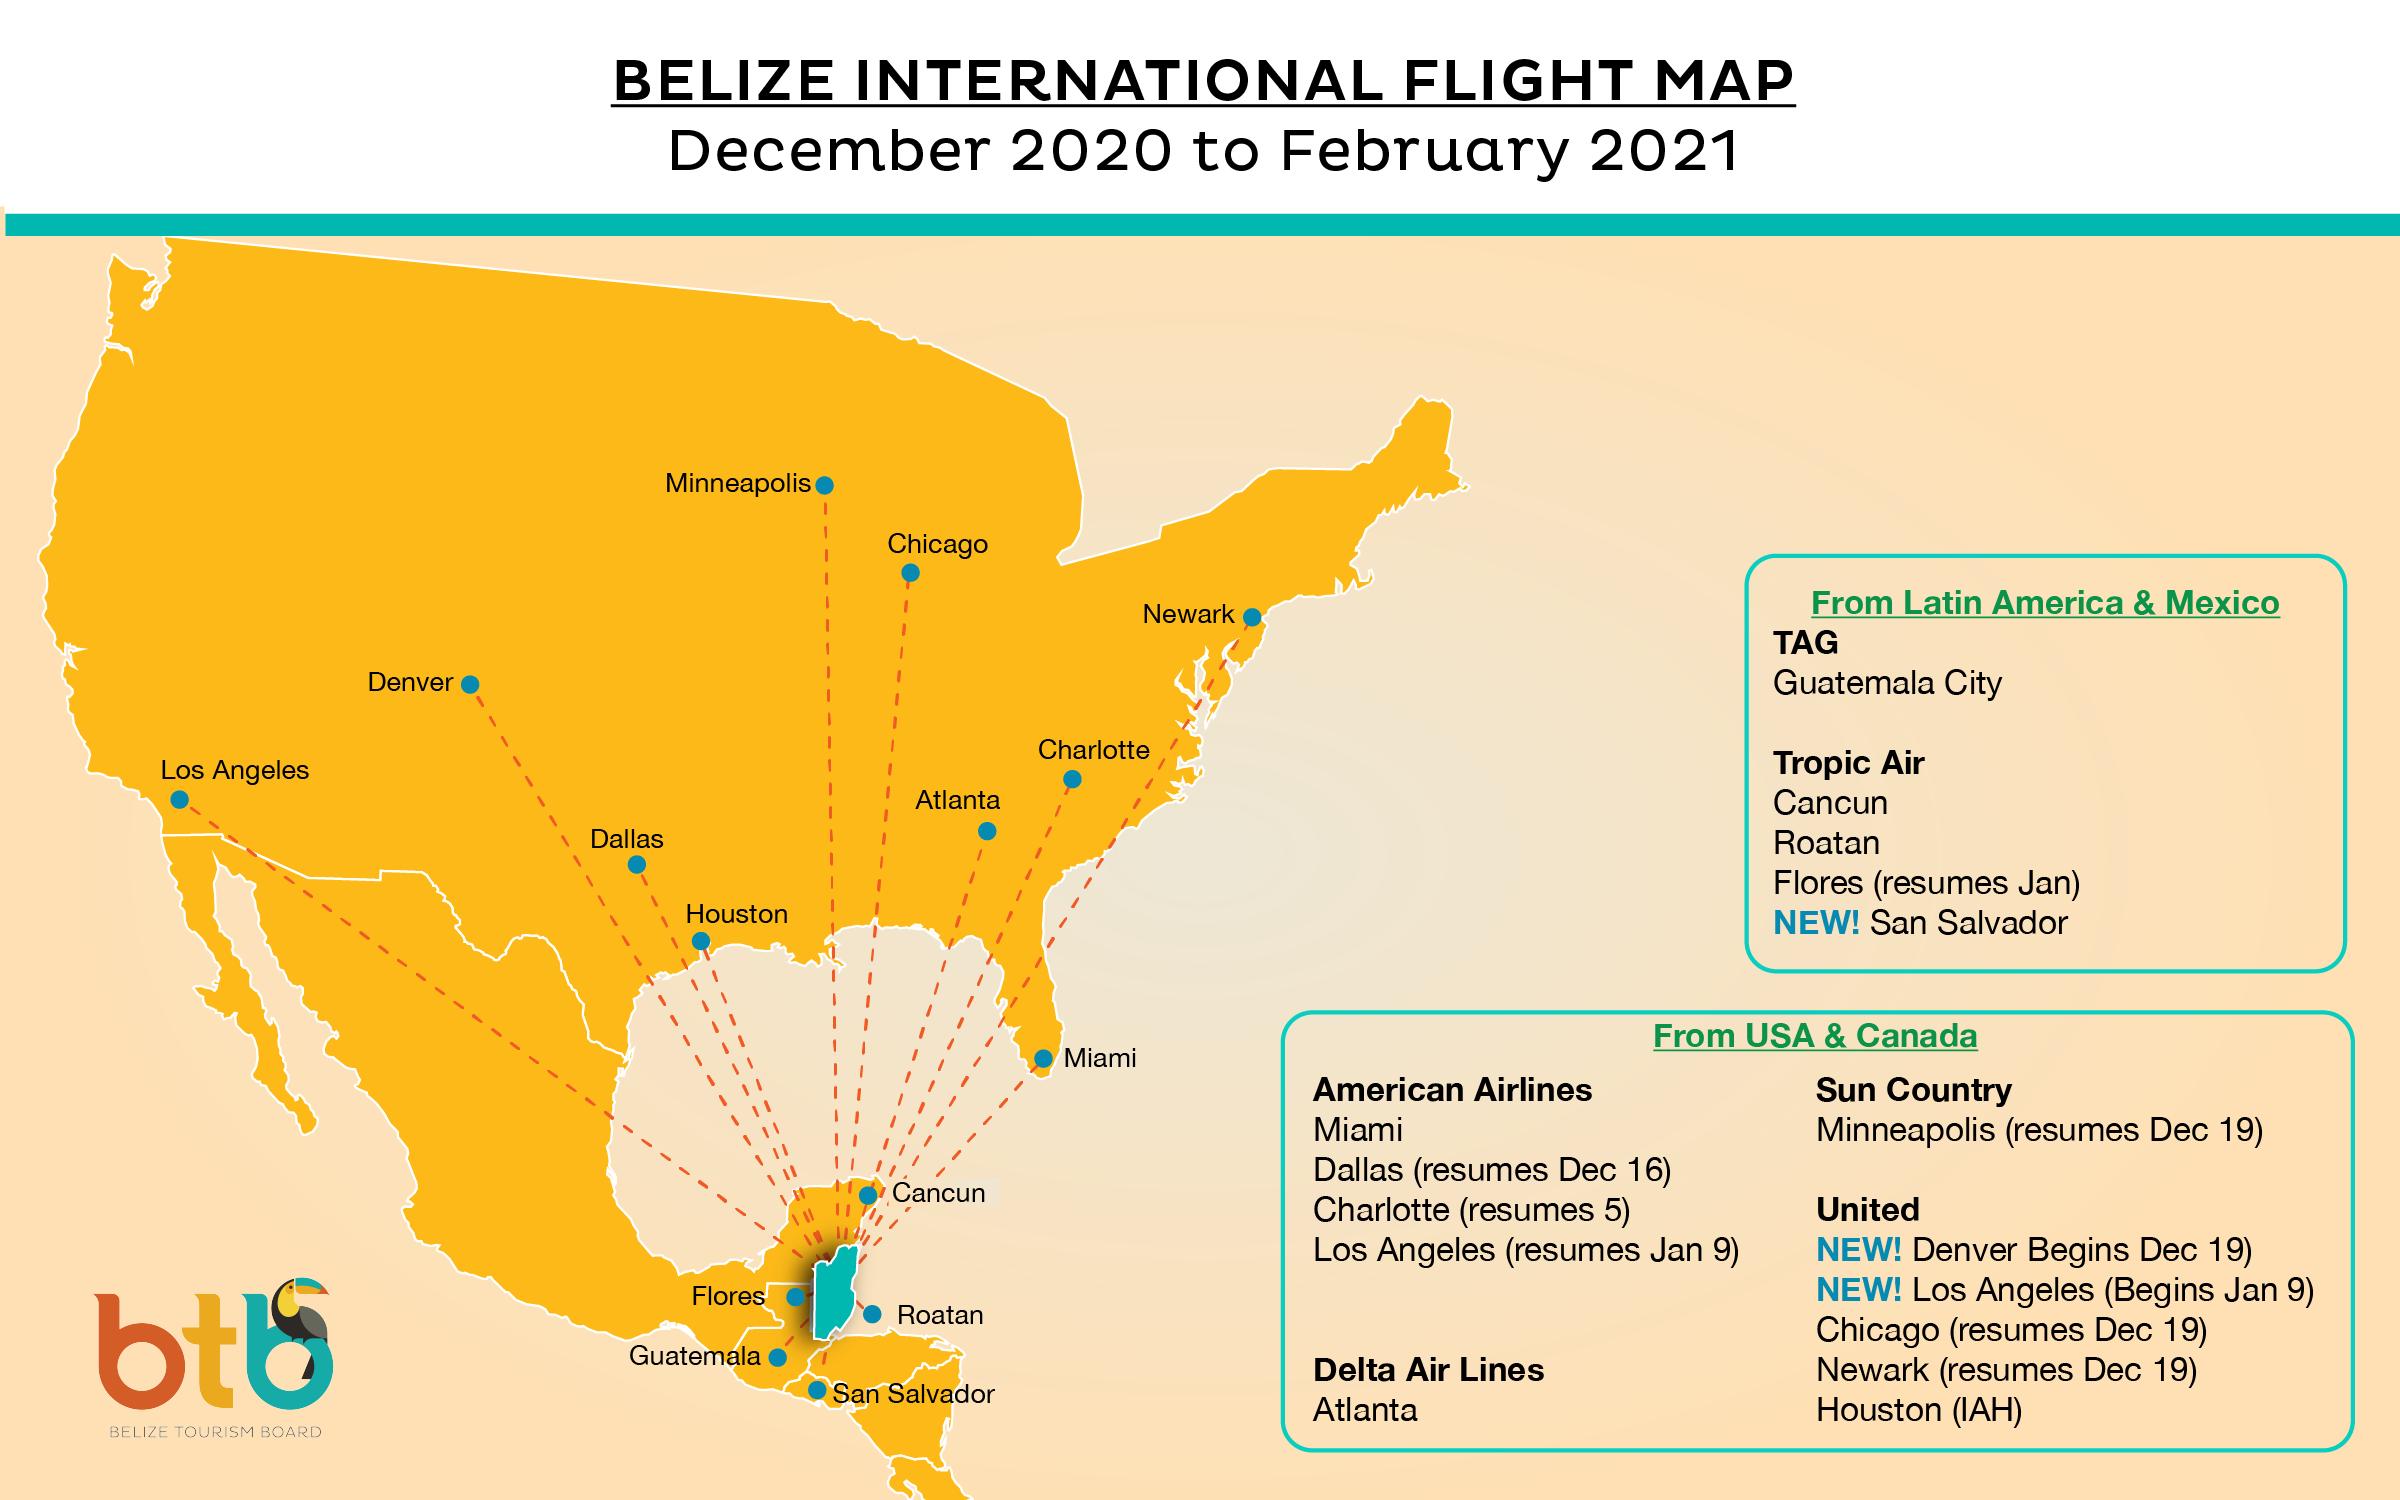 BELIZE FLIGHT MAP